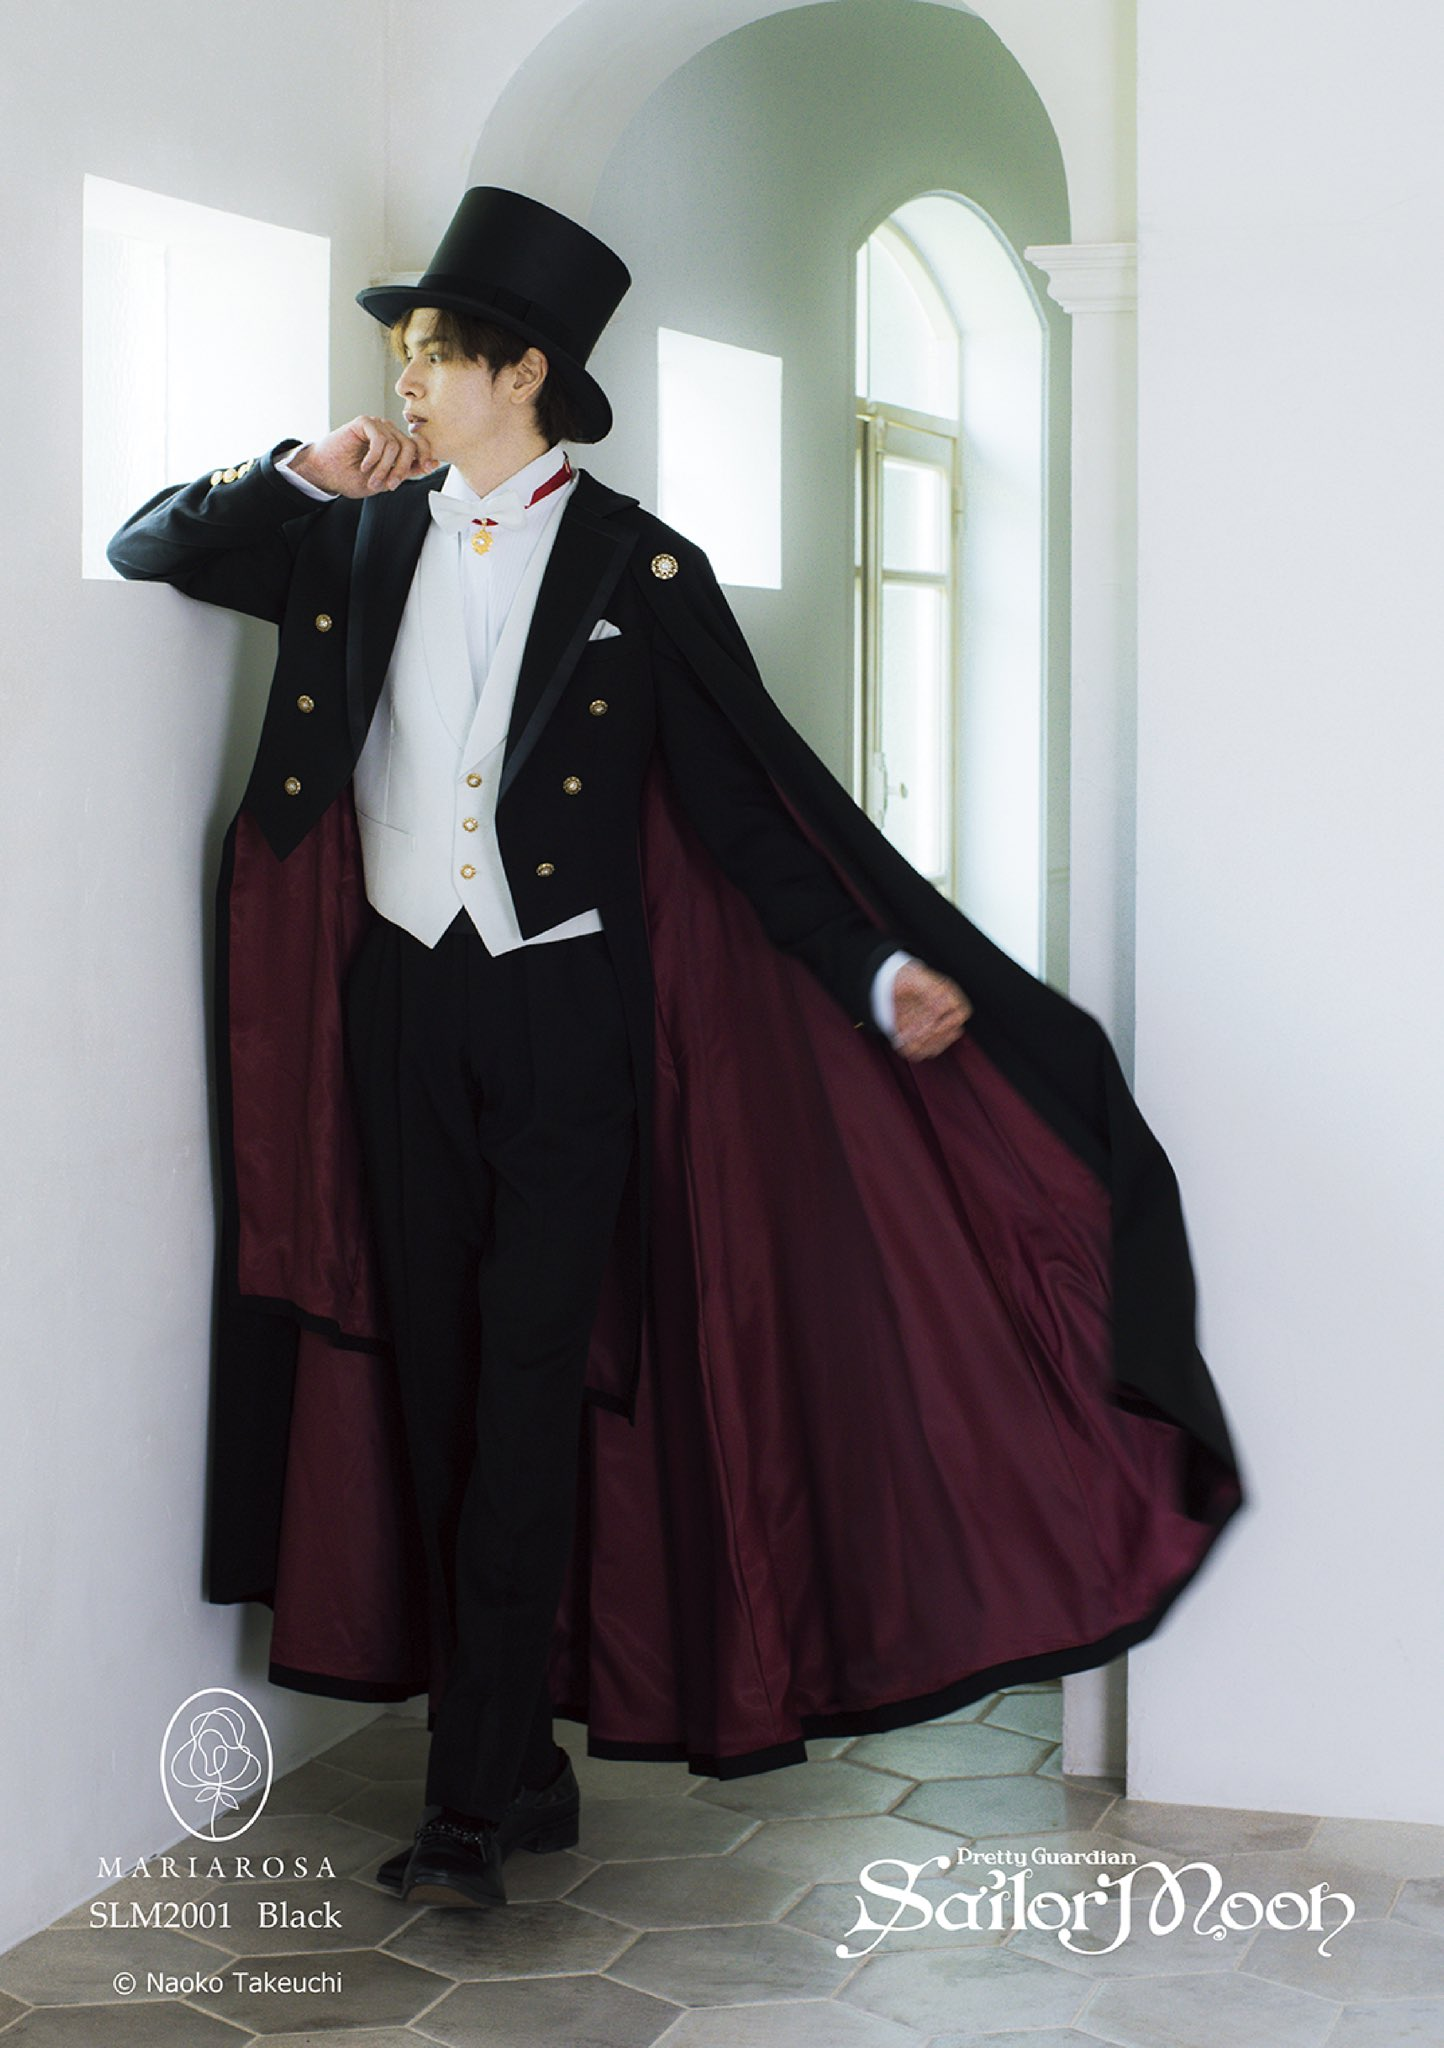 Link a Sailor_Moon_abiti_sposa_naoko_takeuchi-7